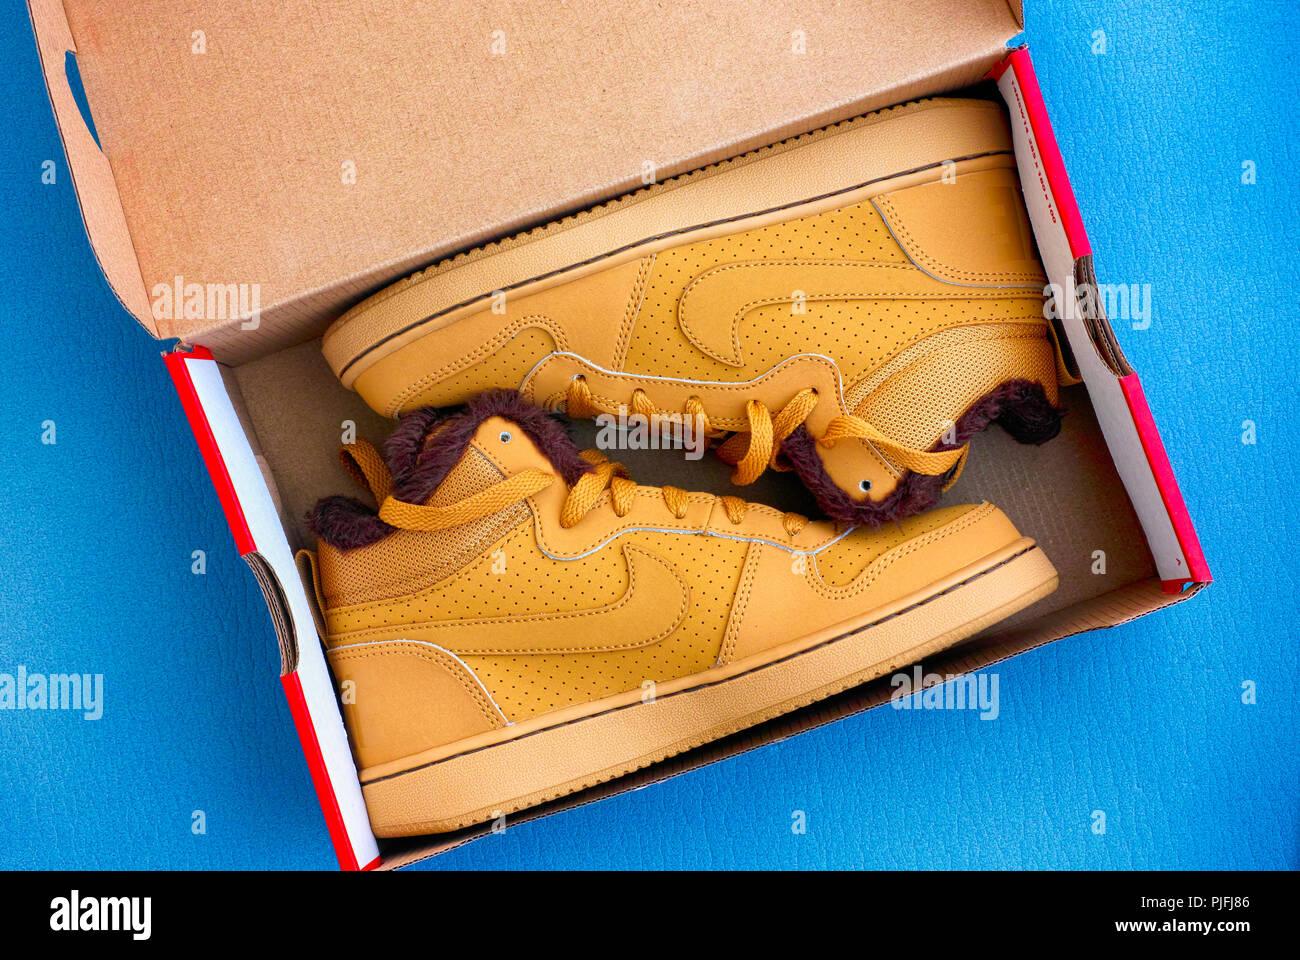 Court Shoe Imágenes De Stock   Court Shoe Fotos De Stock - Alamy 1bae7edd3ca9